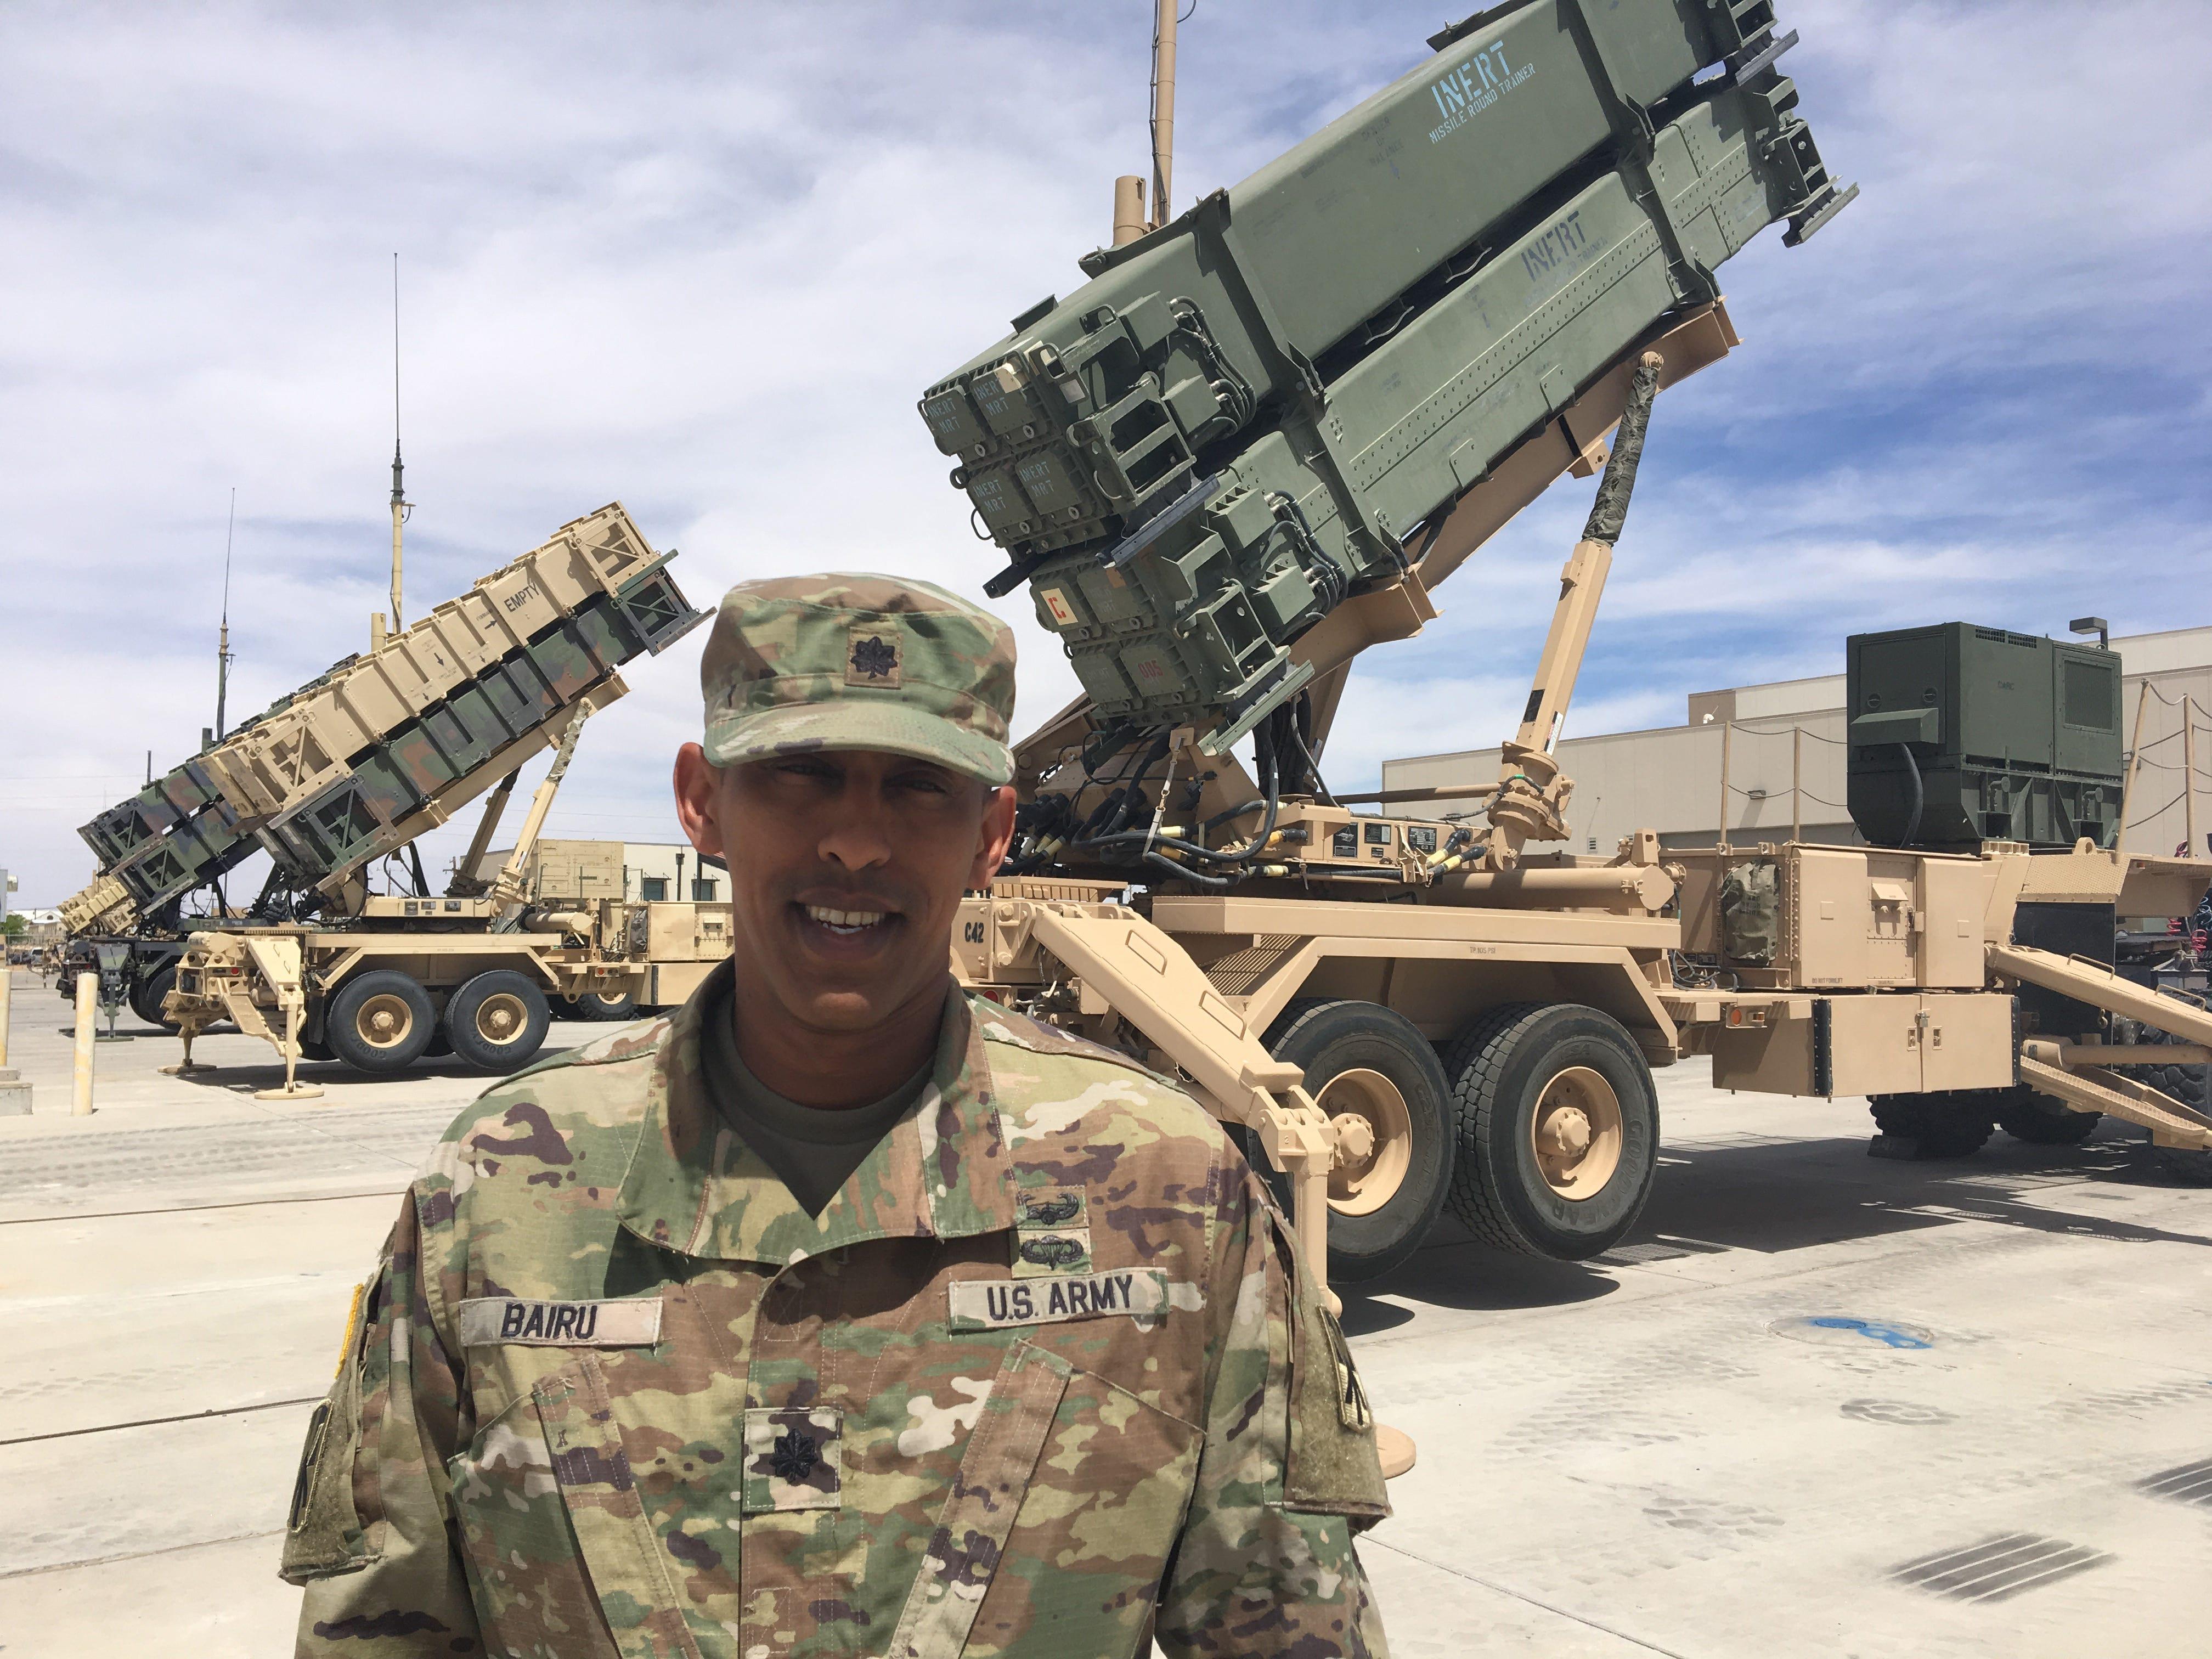 Lt. Col. Haileyesus Bairu 'on cloud nine' about serving as Legion commander at Fort Bliss   El Paso Times